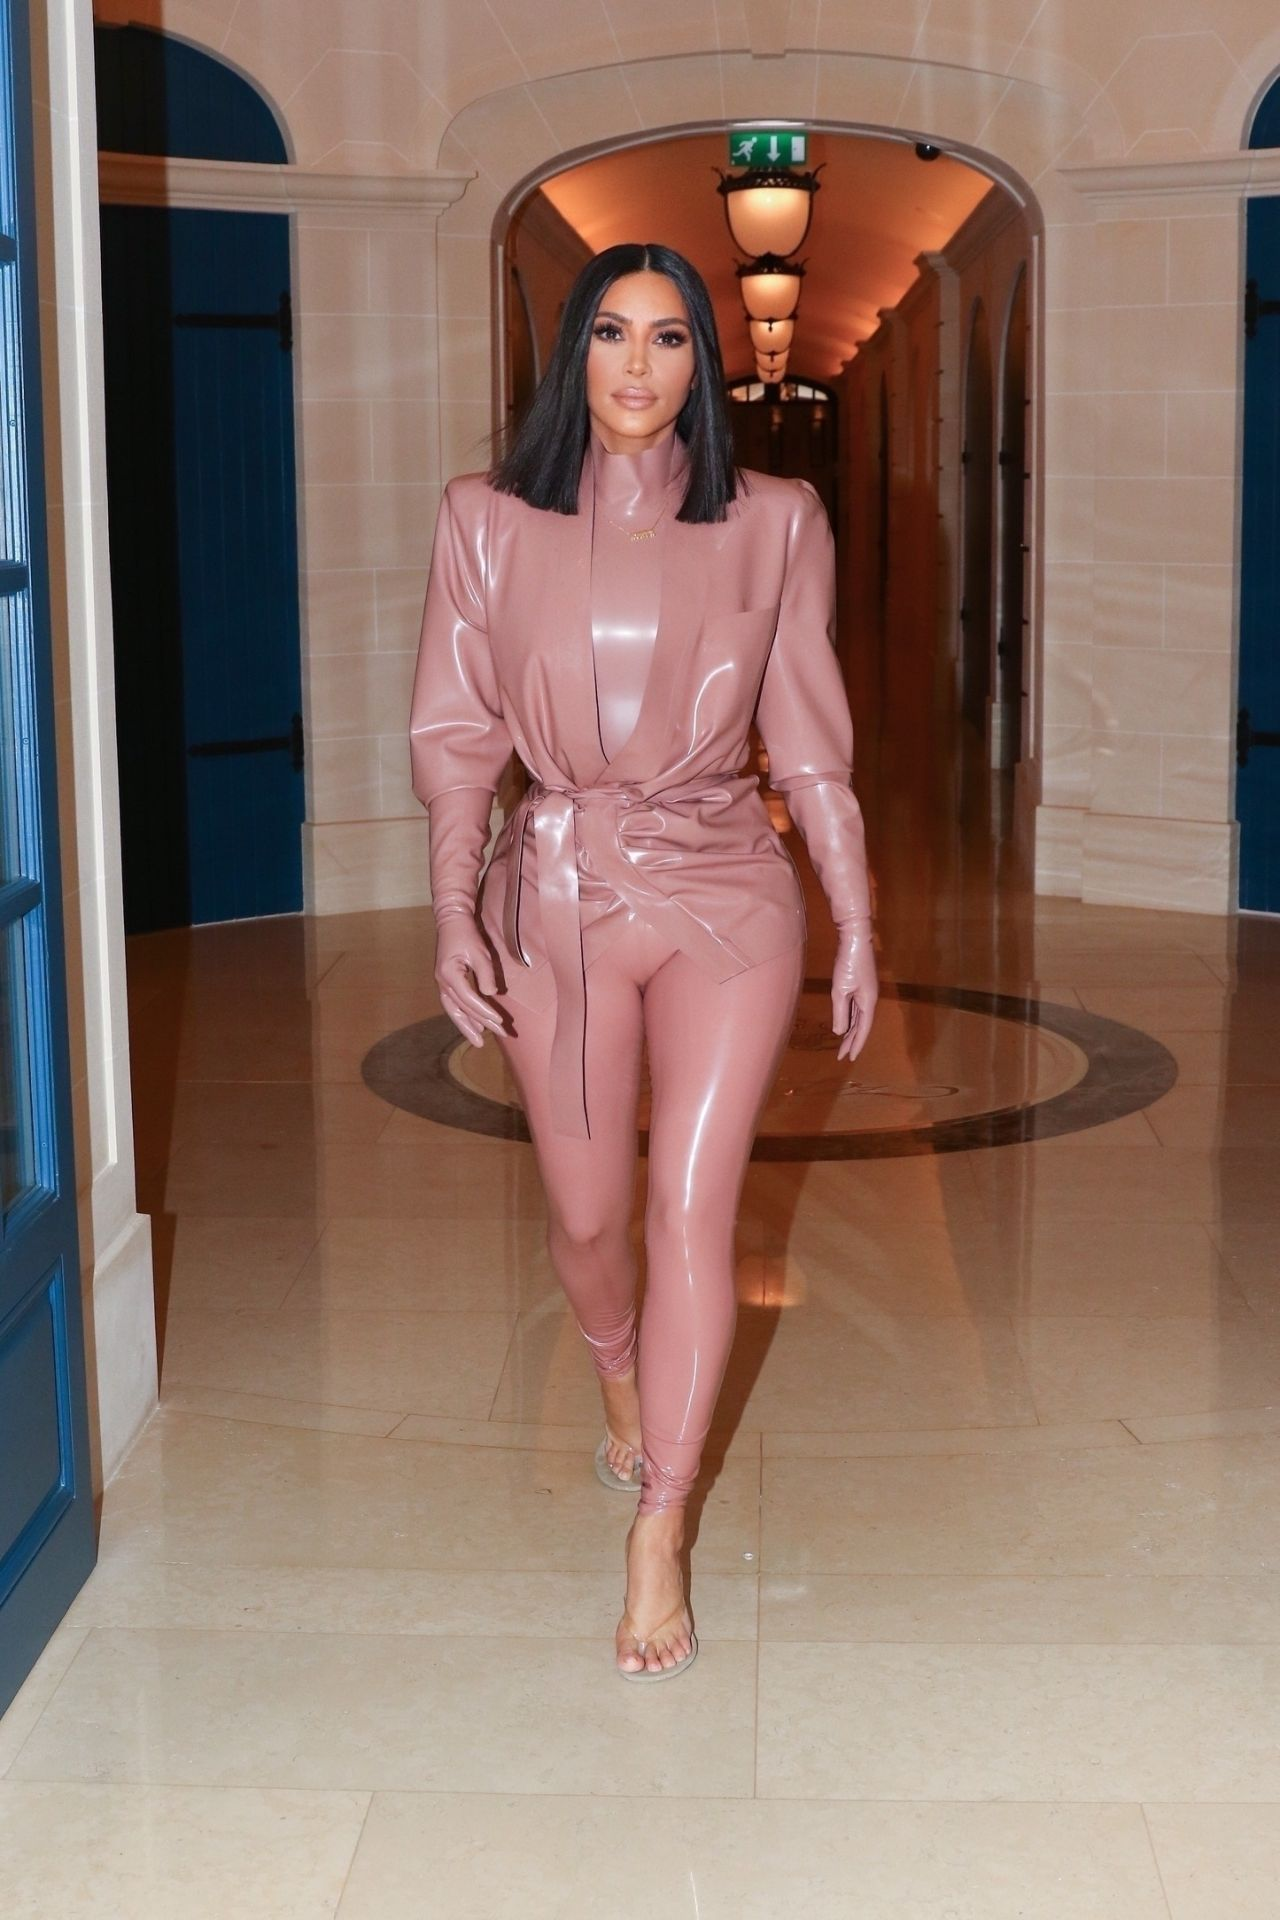 kim-kardashian-in-balmain-latex-outfit-out-in-paris